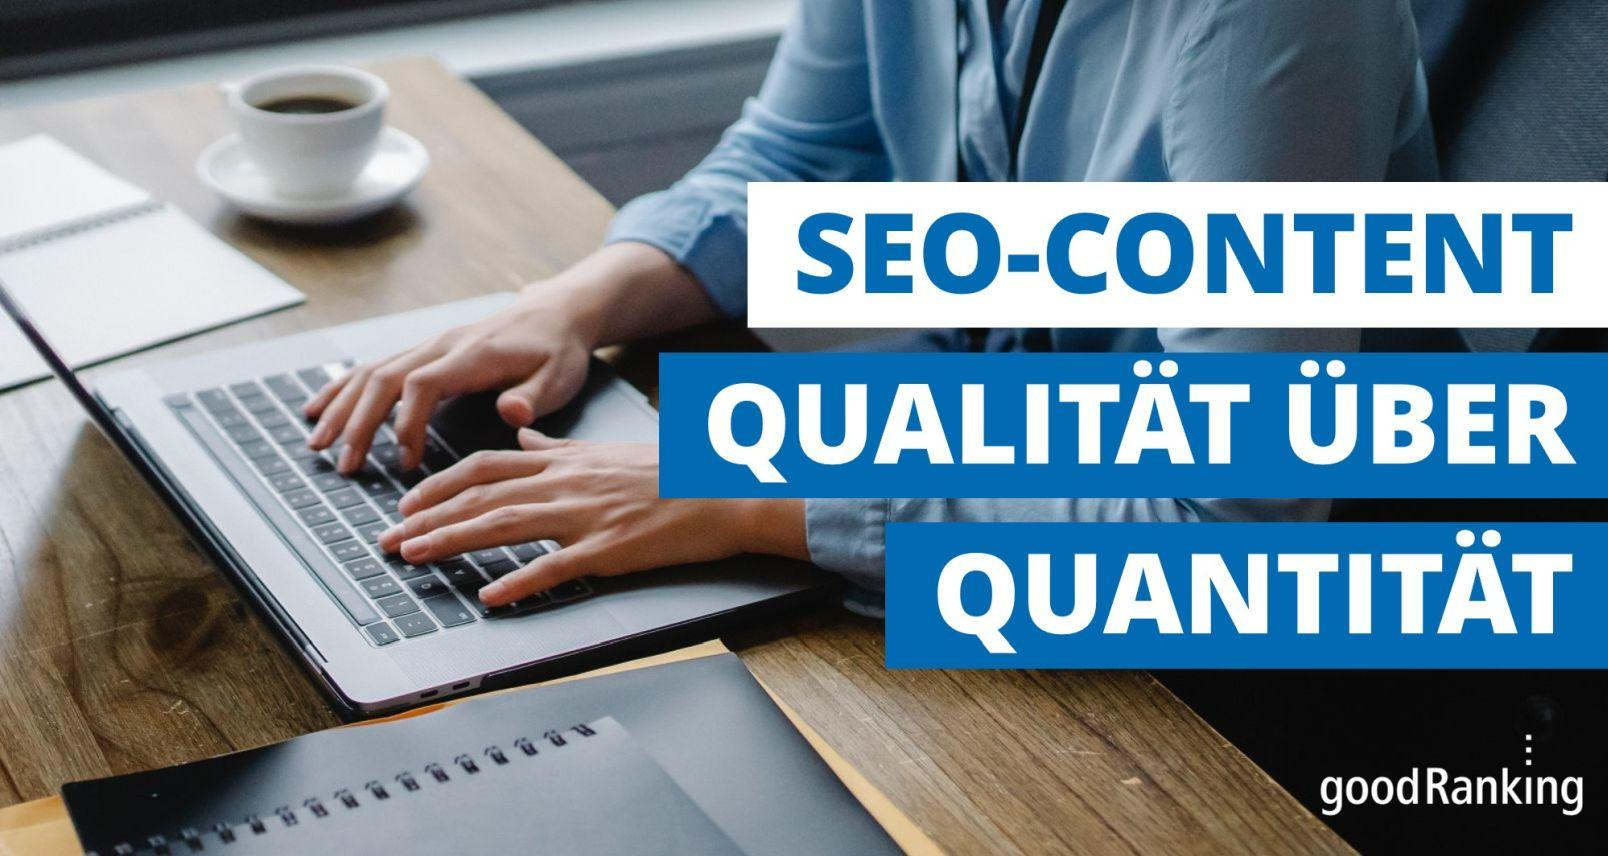 SEO-Content Qualität über Quantität